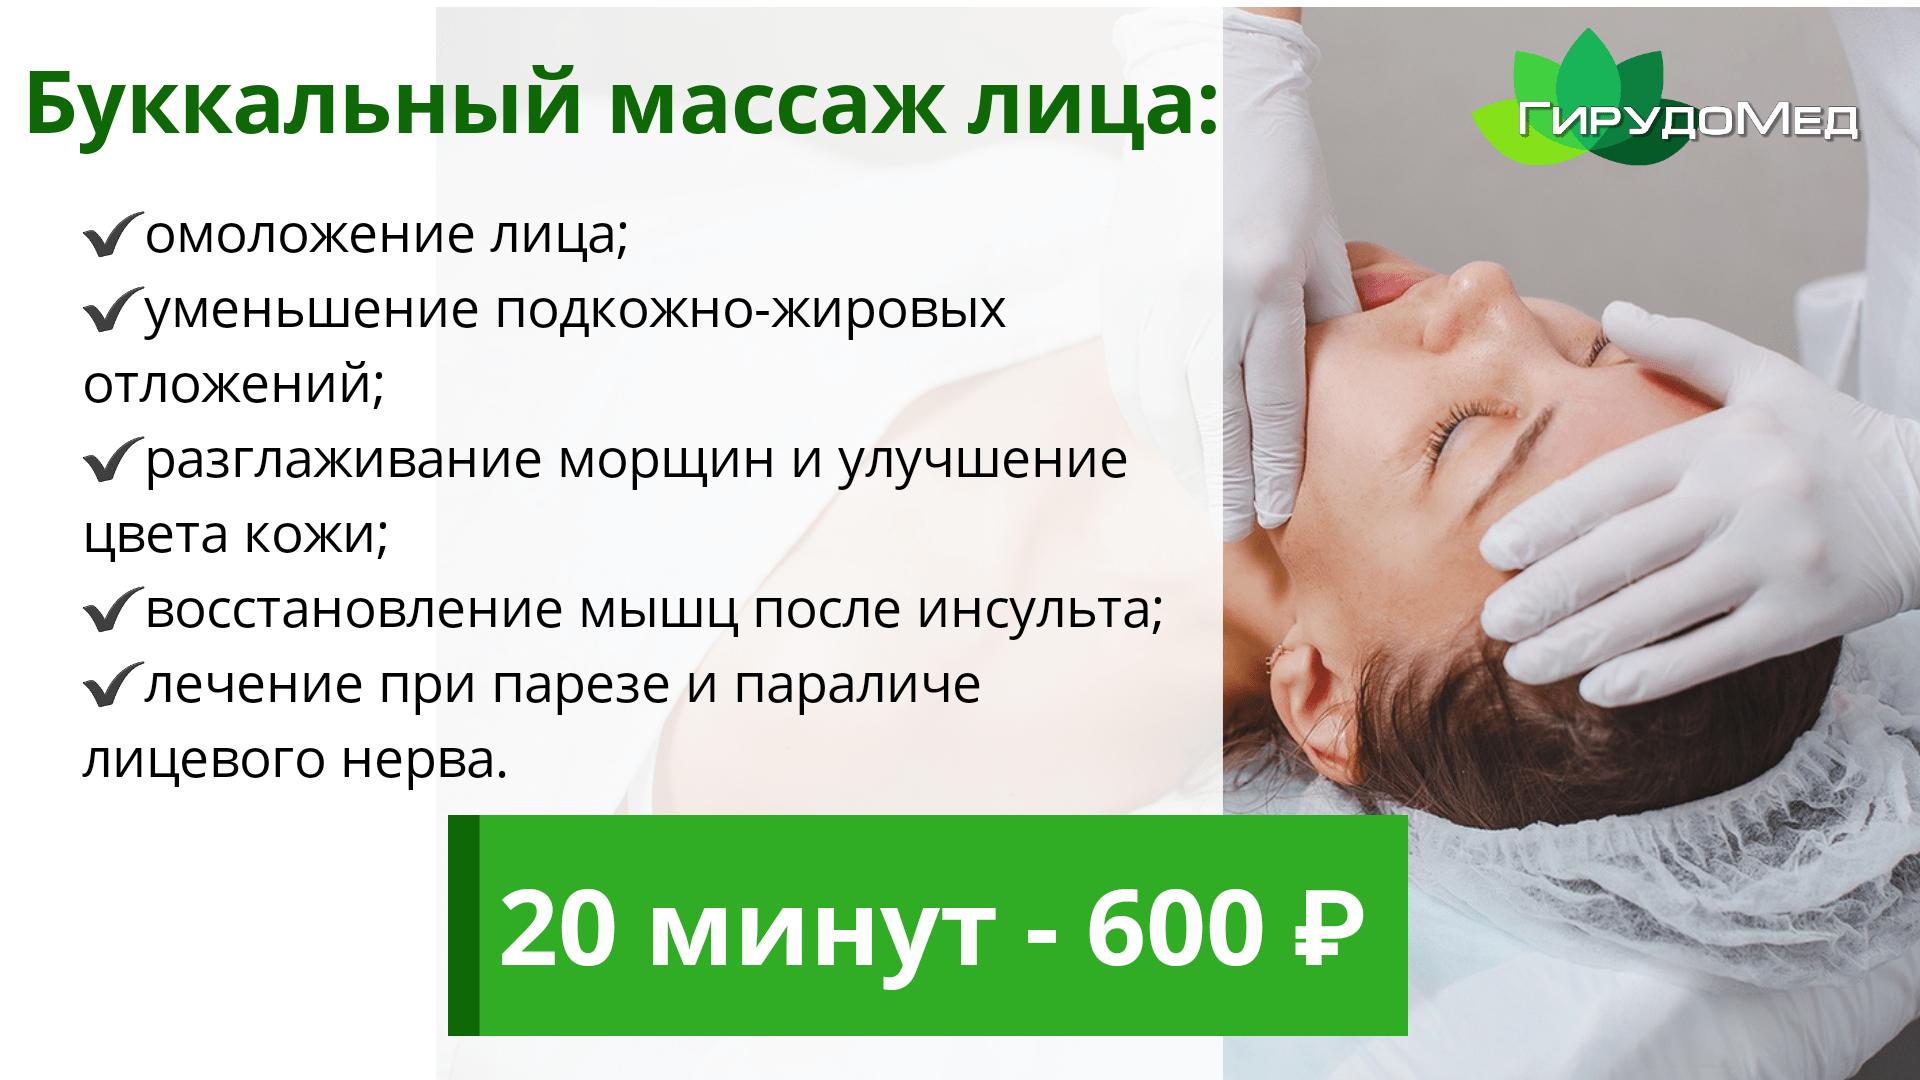 20200701_144659_0000